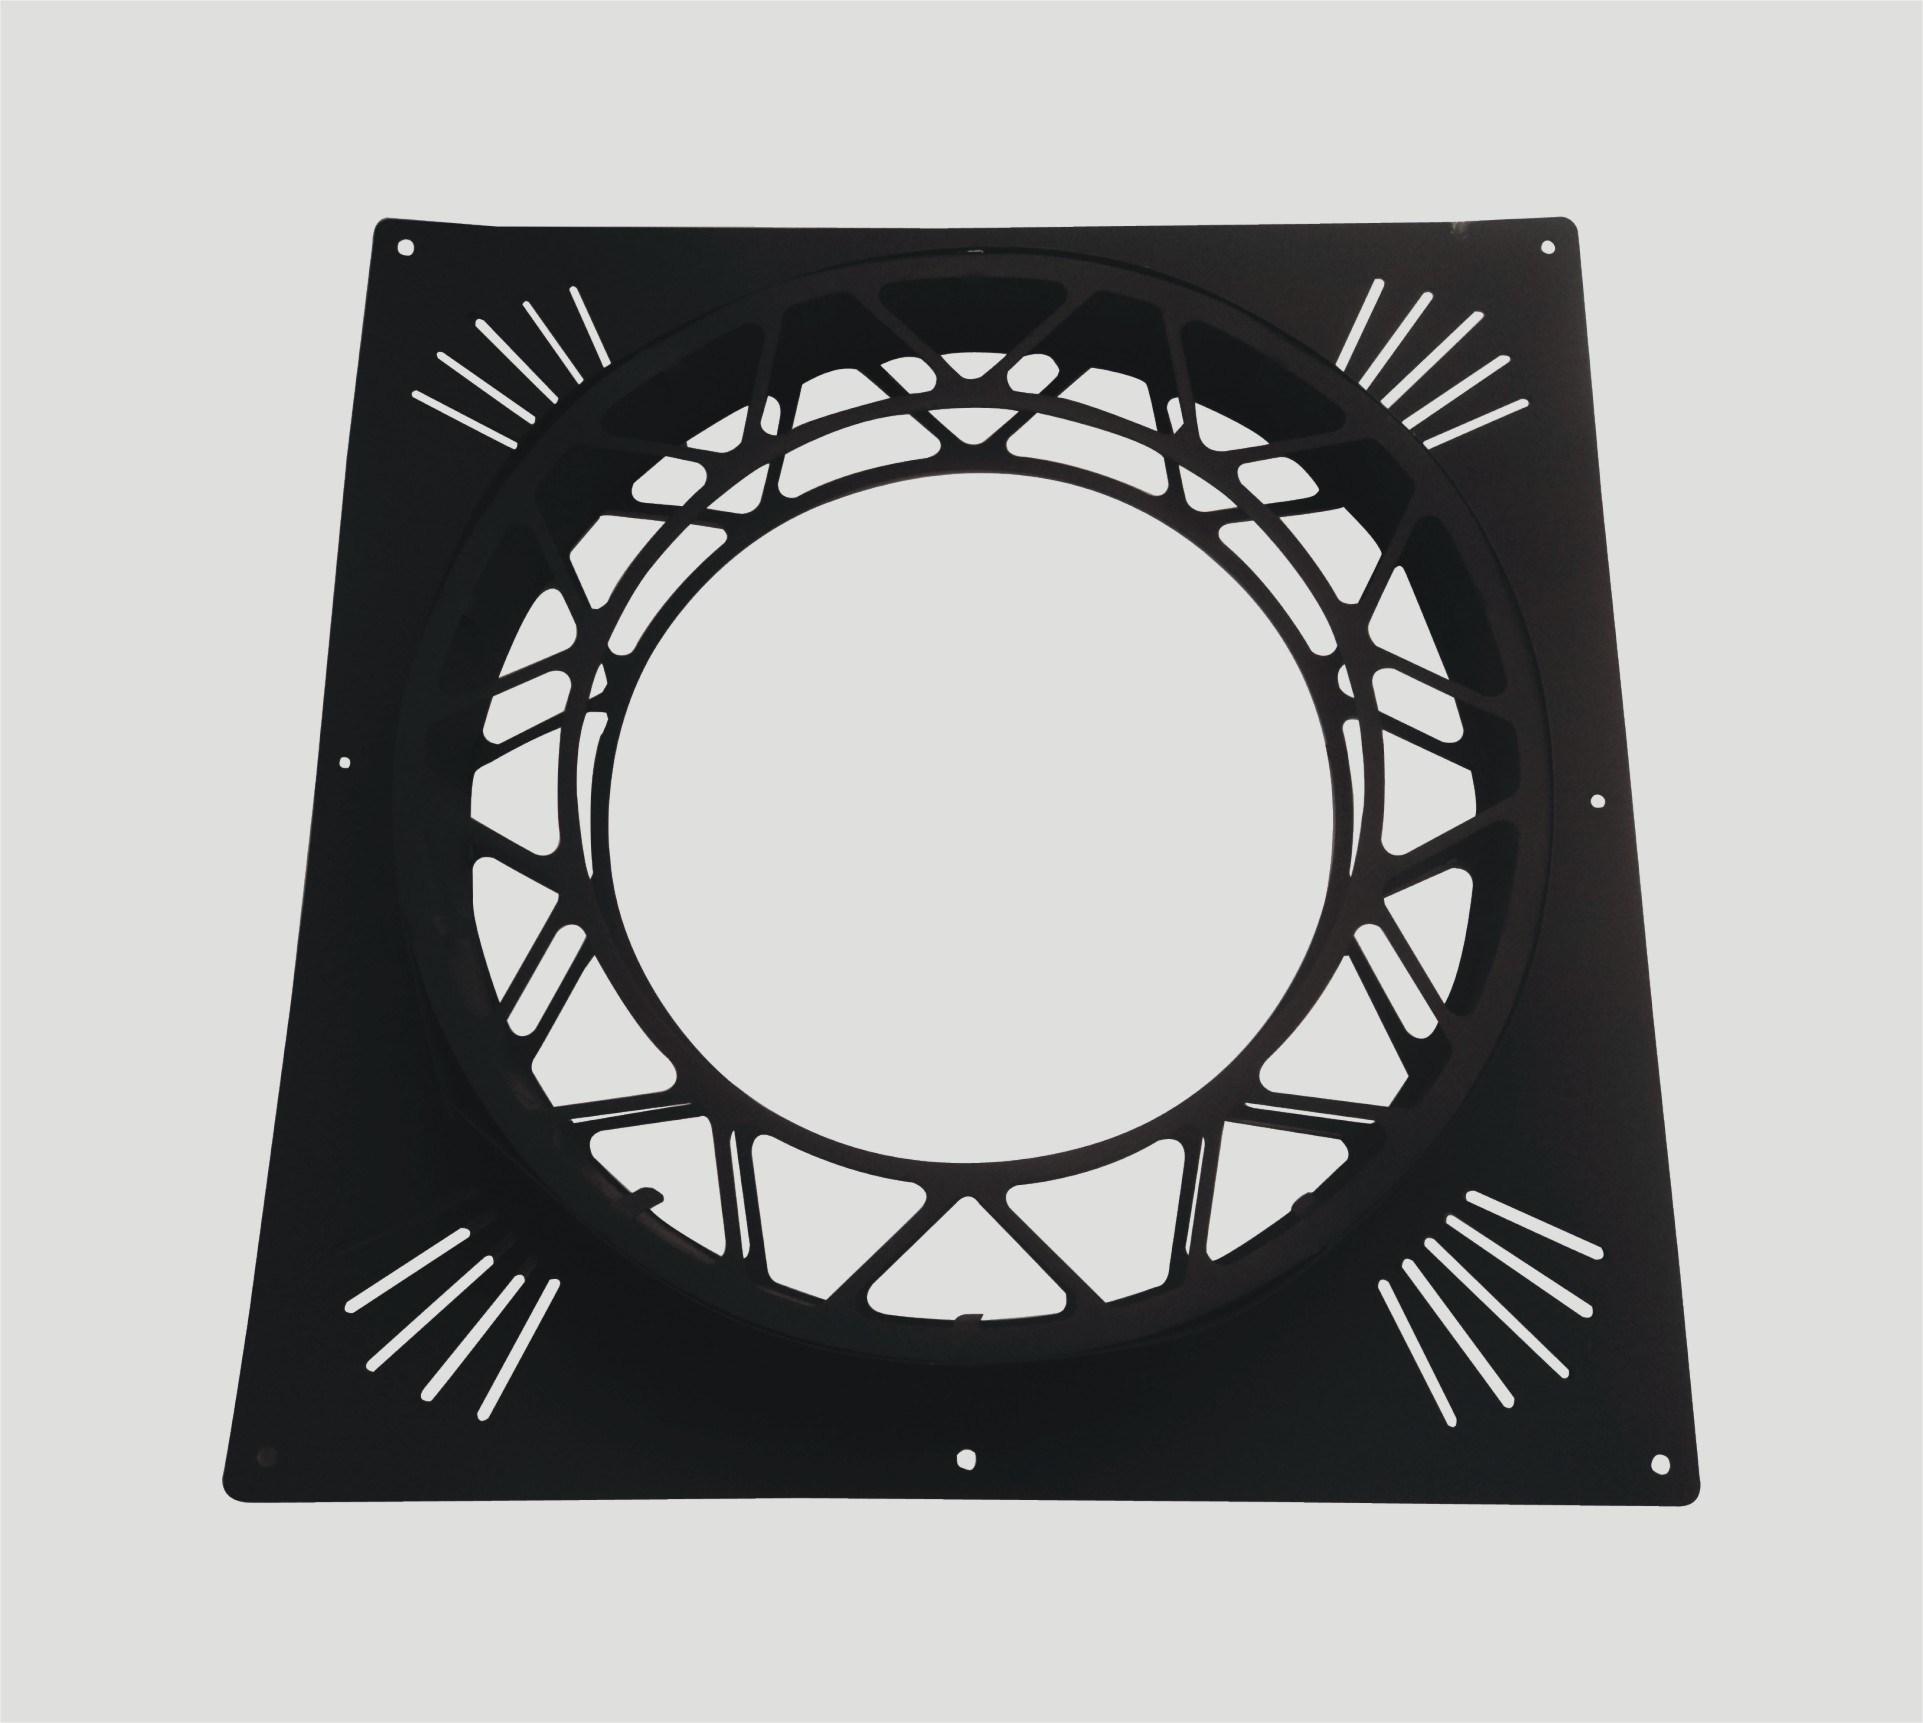 Firestop Black Fireproof Plate for Chimney